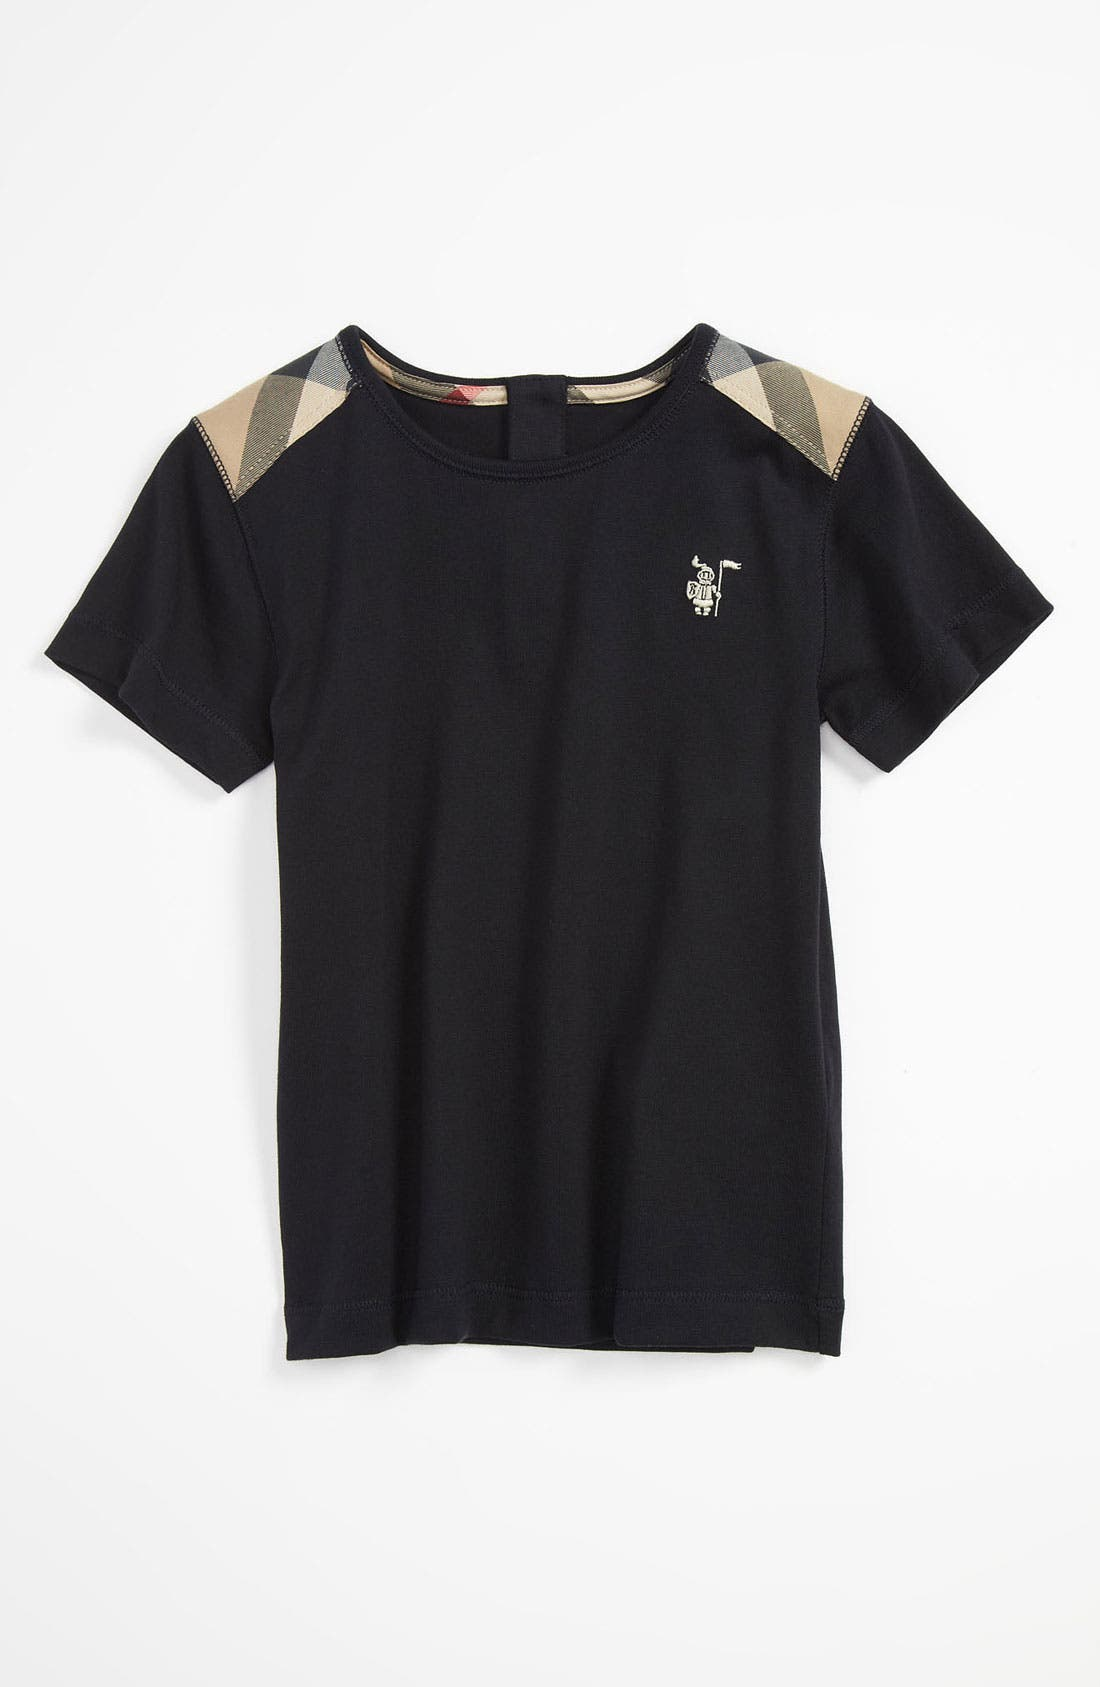 Main Image - Burberry Shoulder Patch T-Shirt (Toddler)